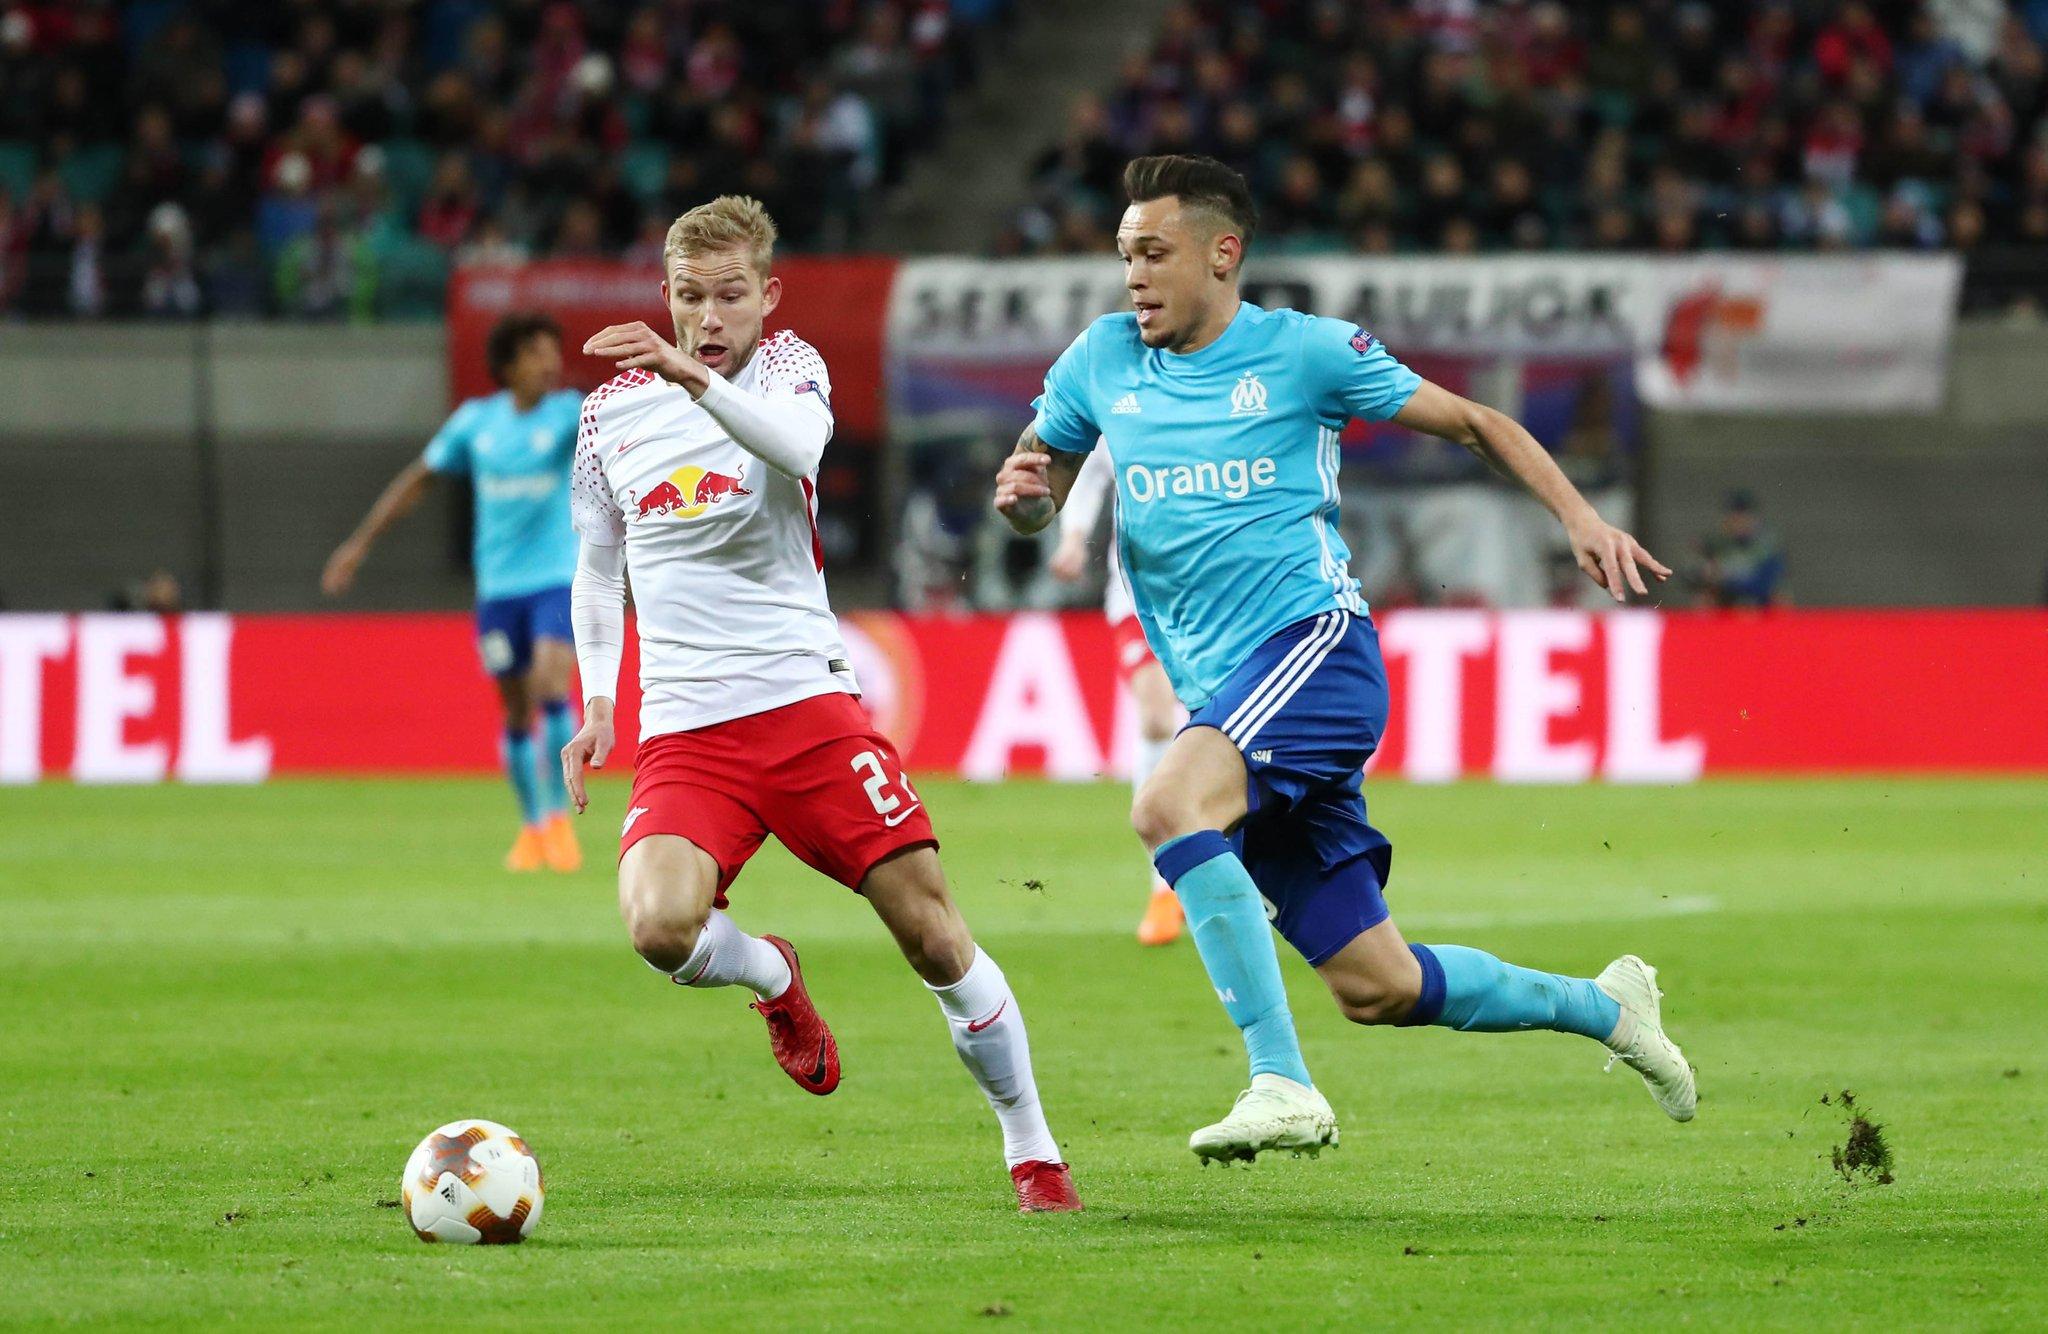 463. RB Leipzig - Olympique Marseille 1:0